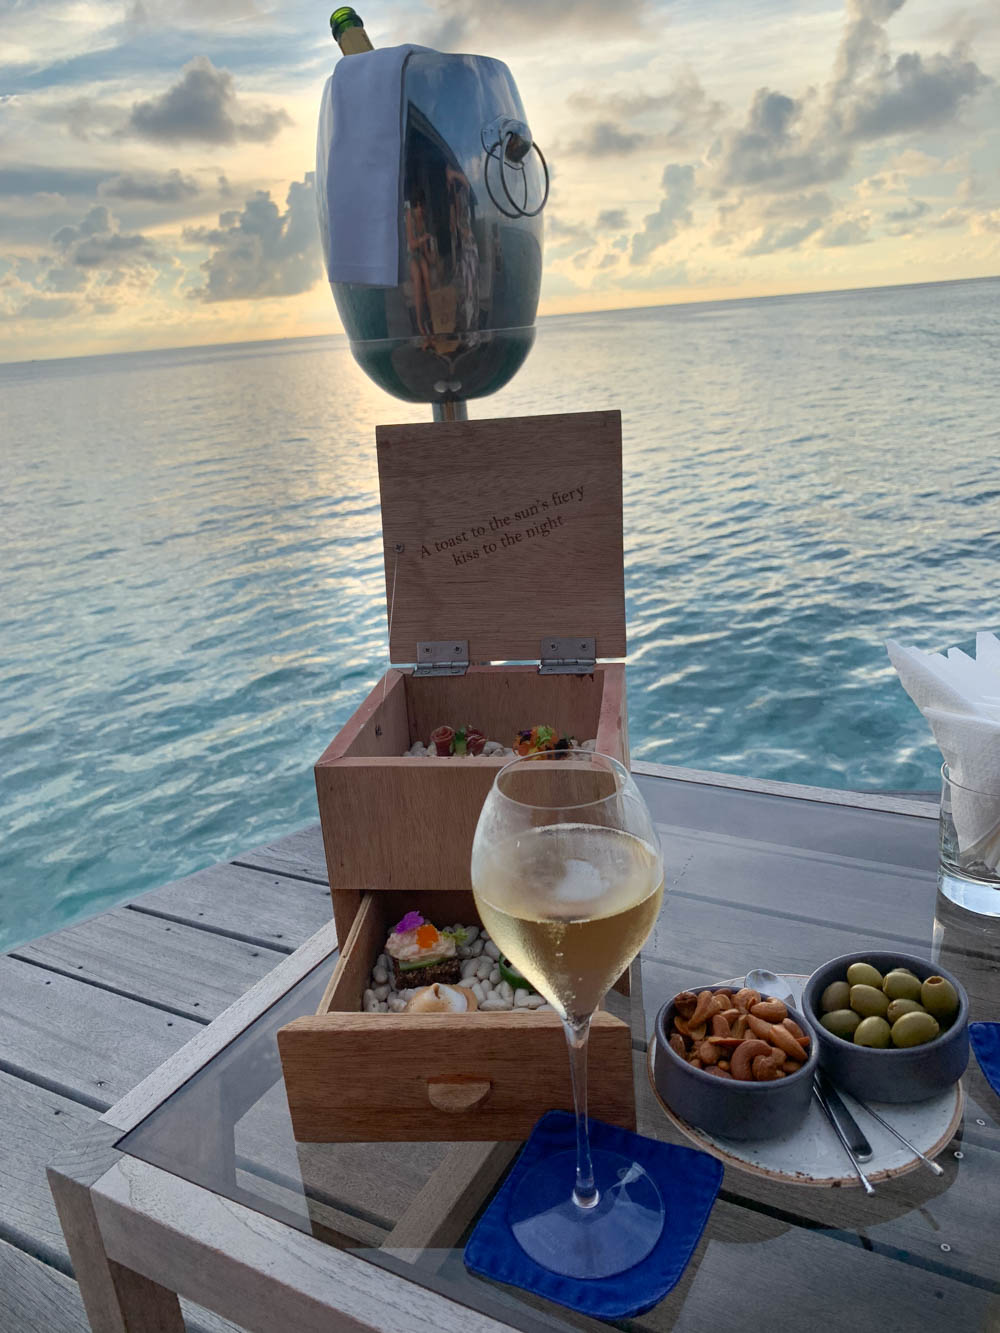 Maldives_Resort_Honeymoon_Hurawalhi_MaldivesTravelAdvisor-25.jpg